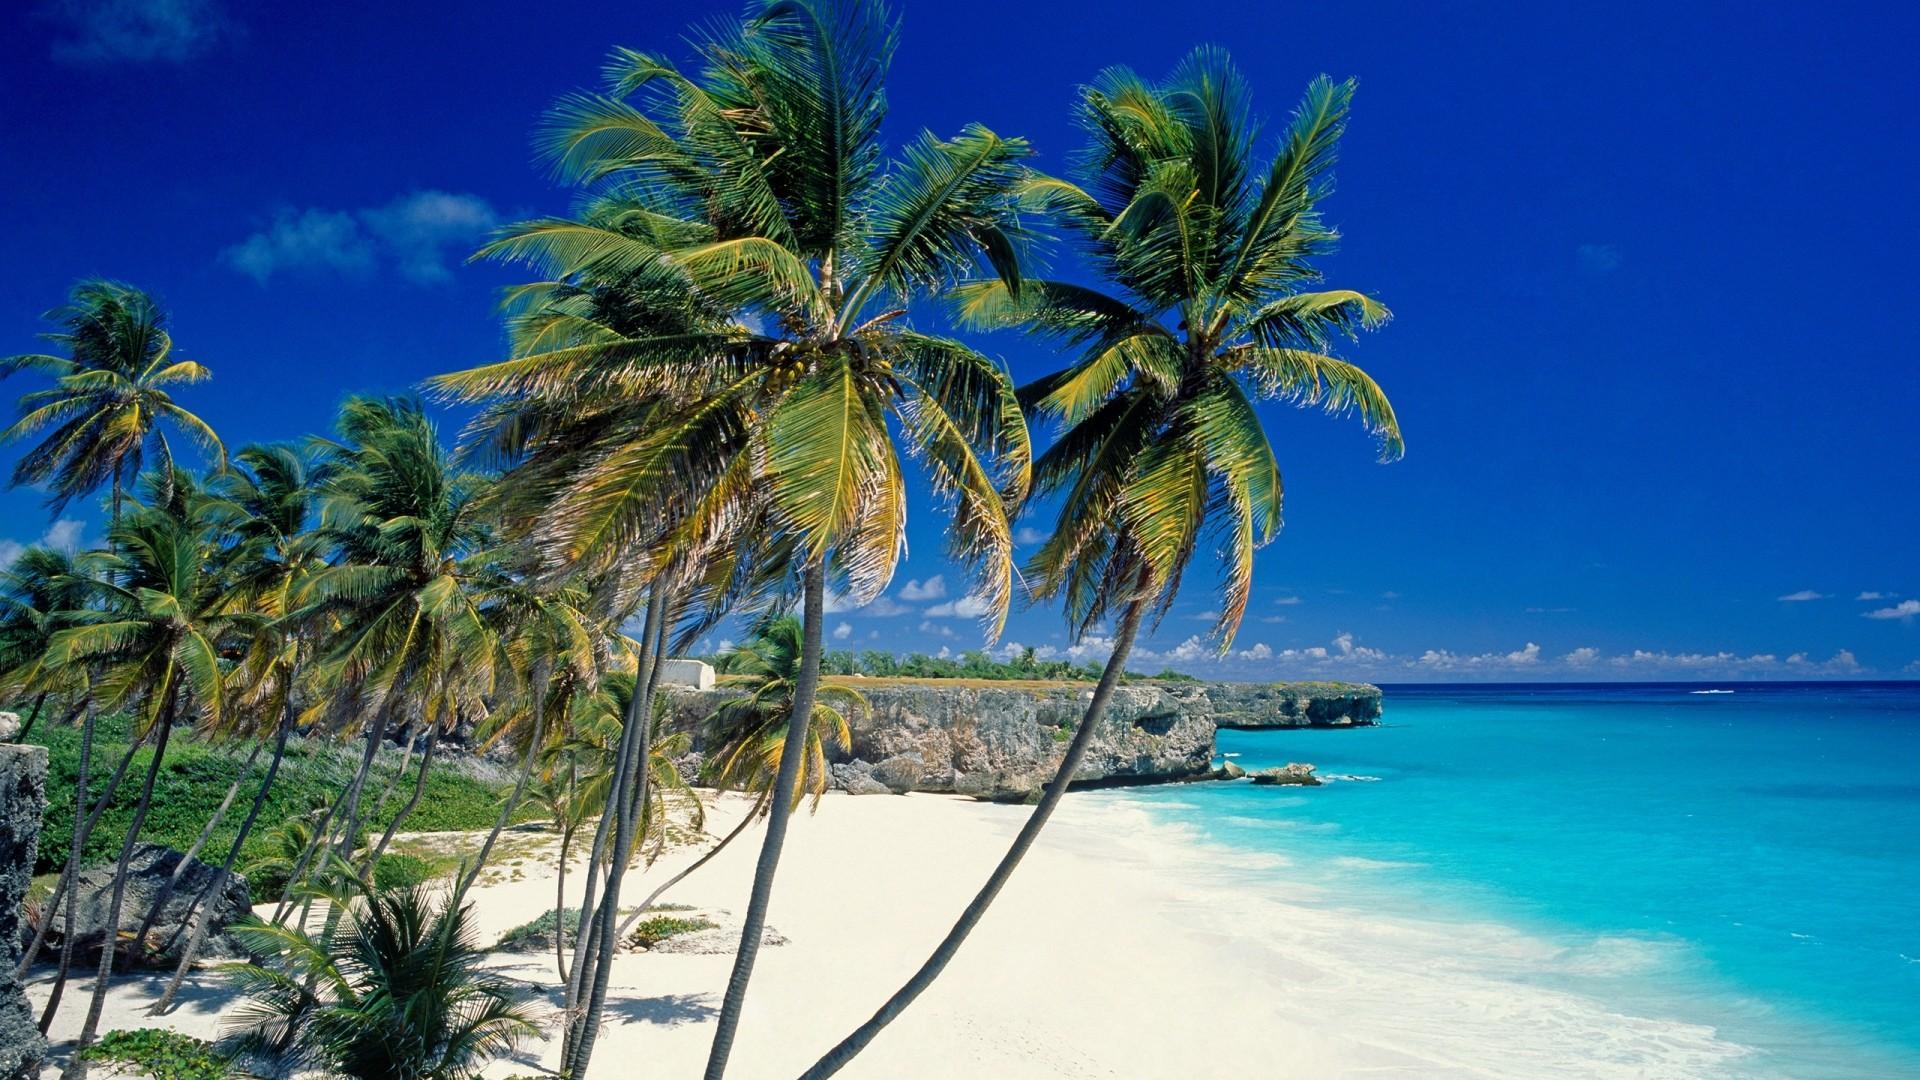 Wallpaper beach, tropics, sea, sand, palm trees, beautiful